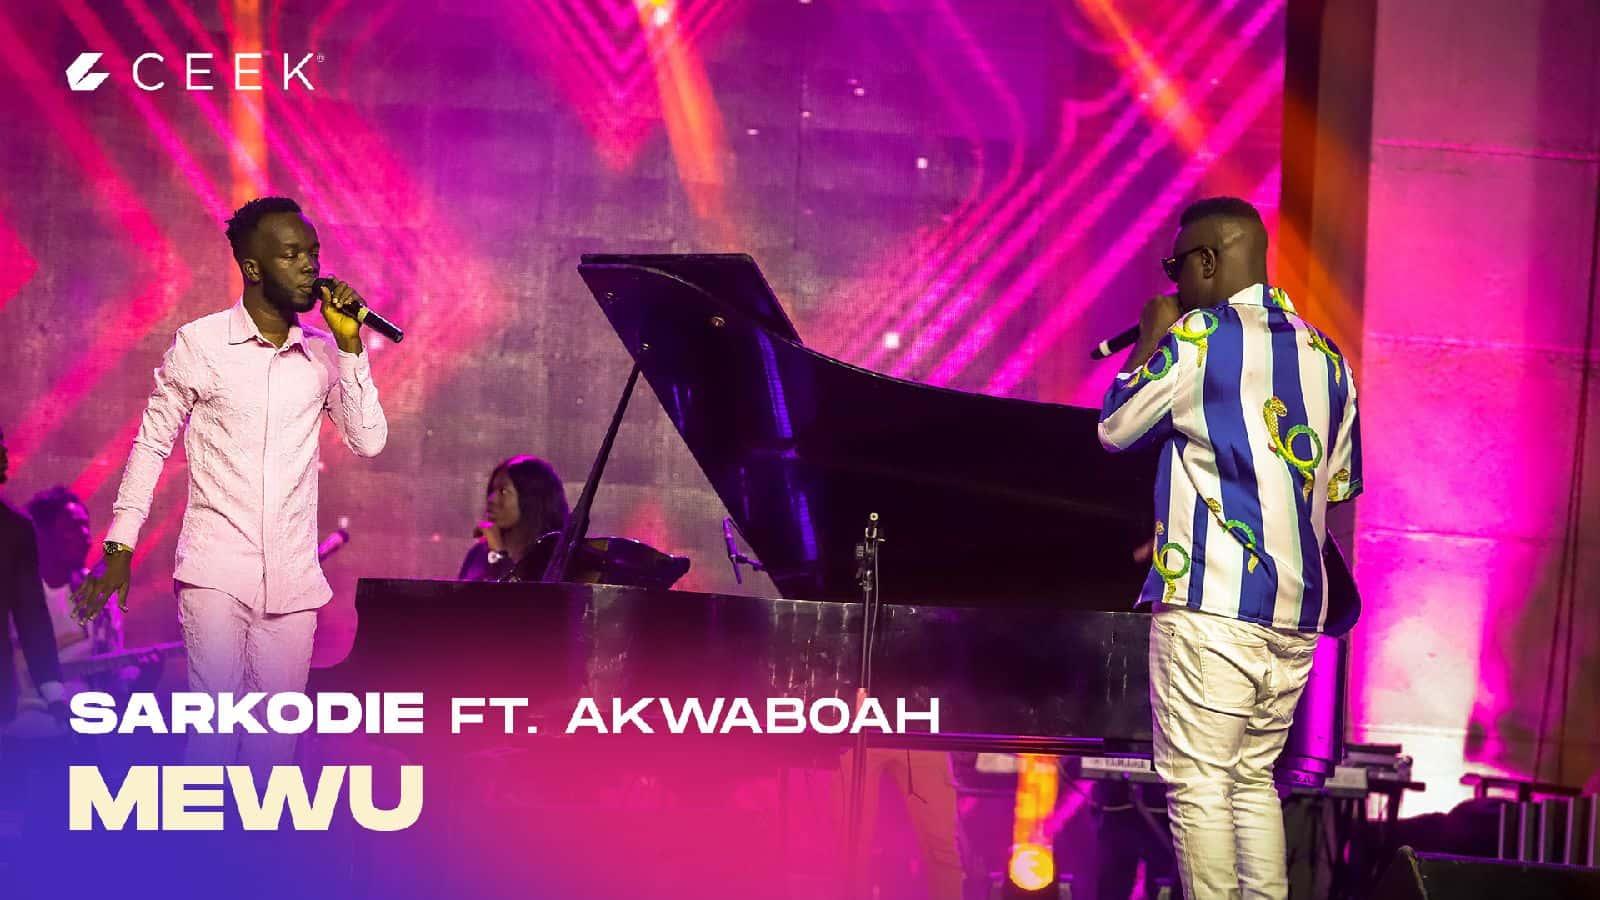 Mewu ft. Akwaboah